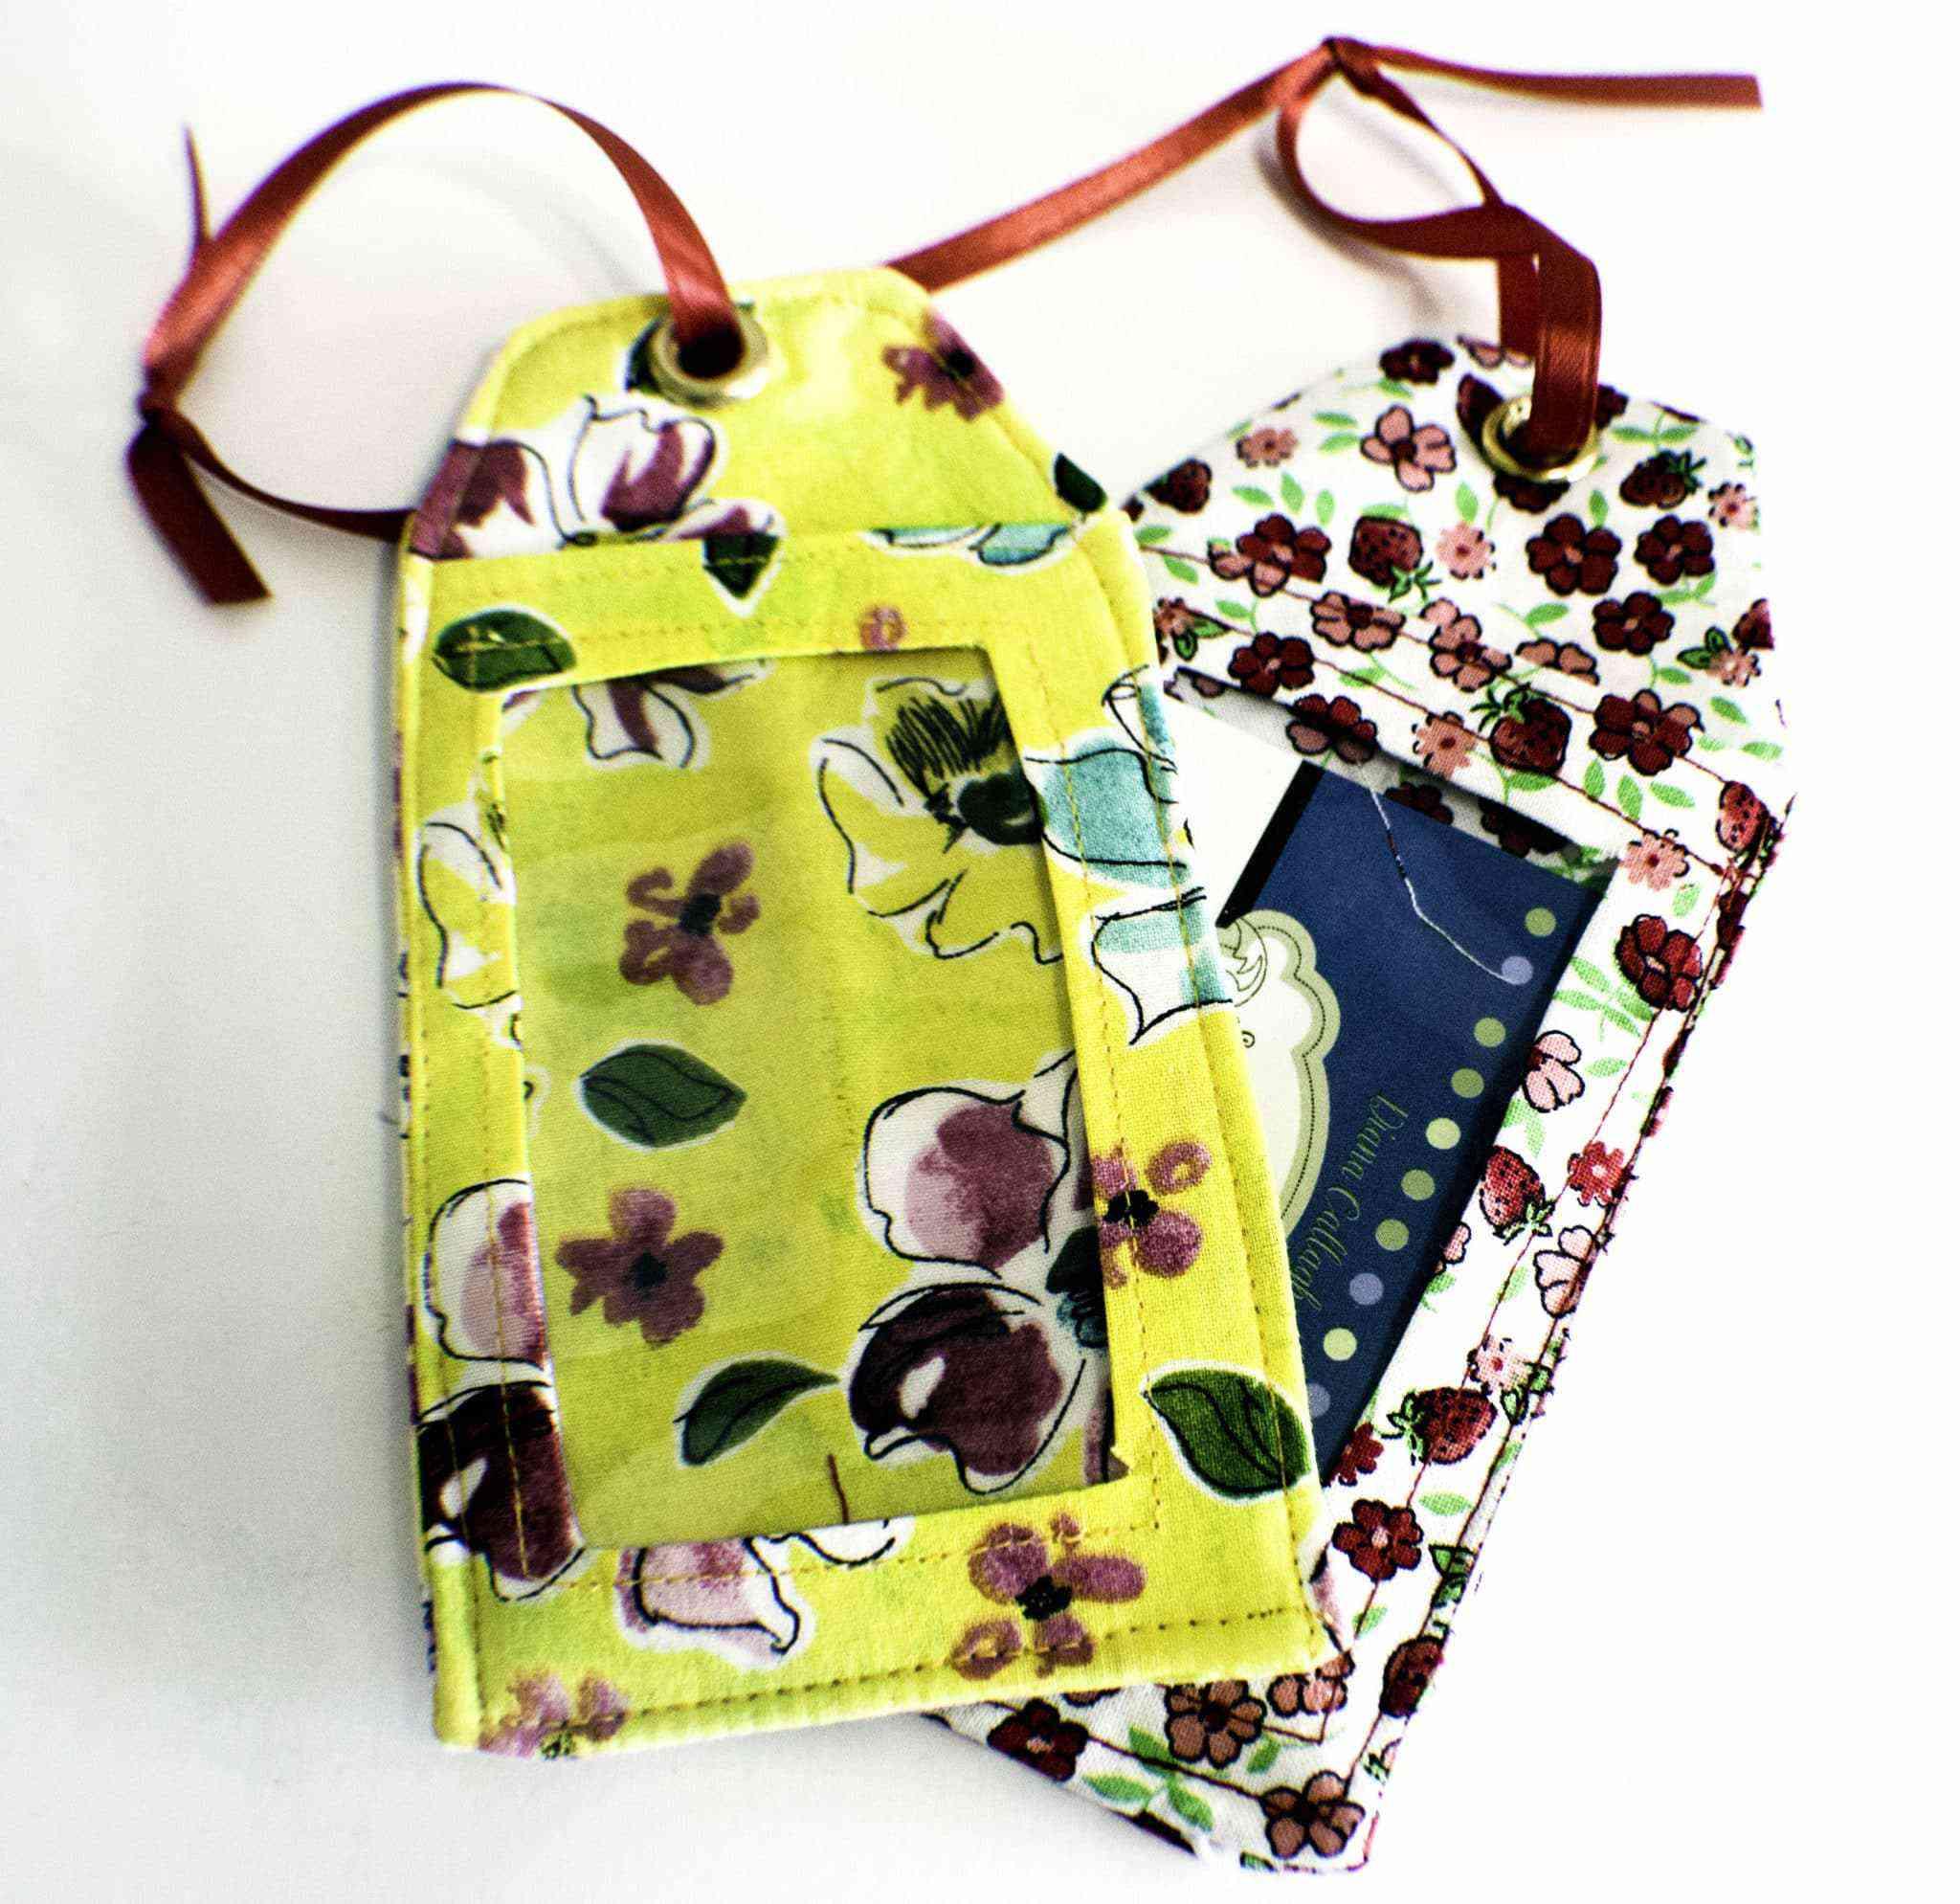 Hand-sewn luggage tags